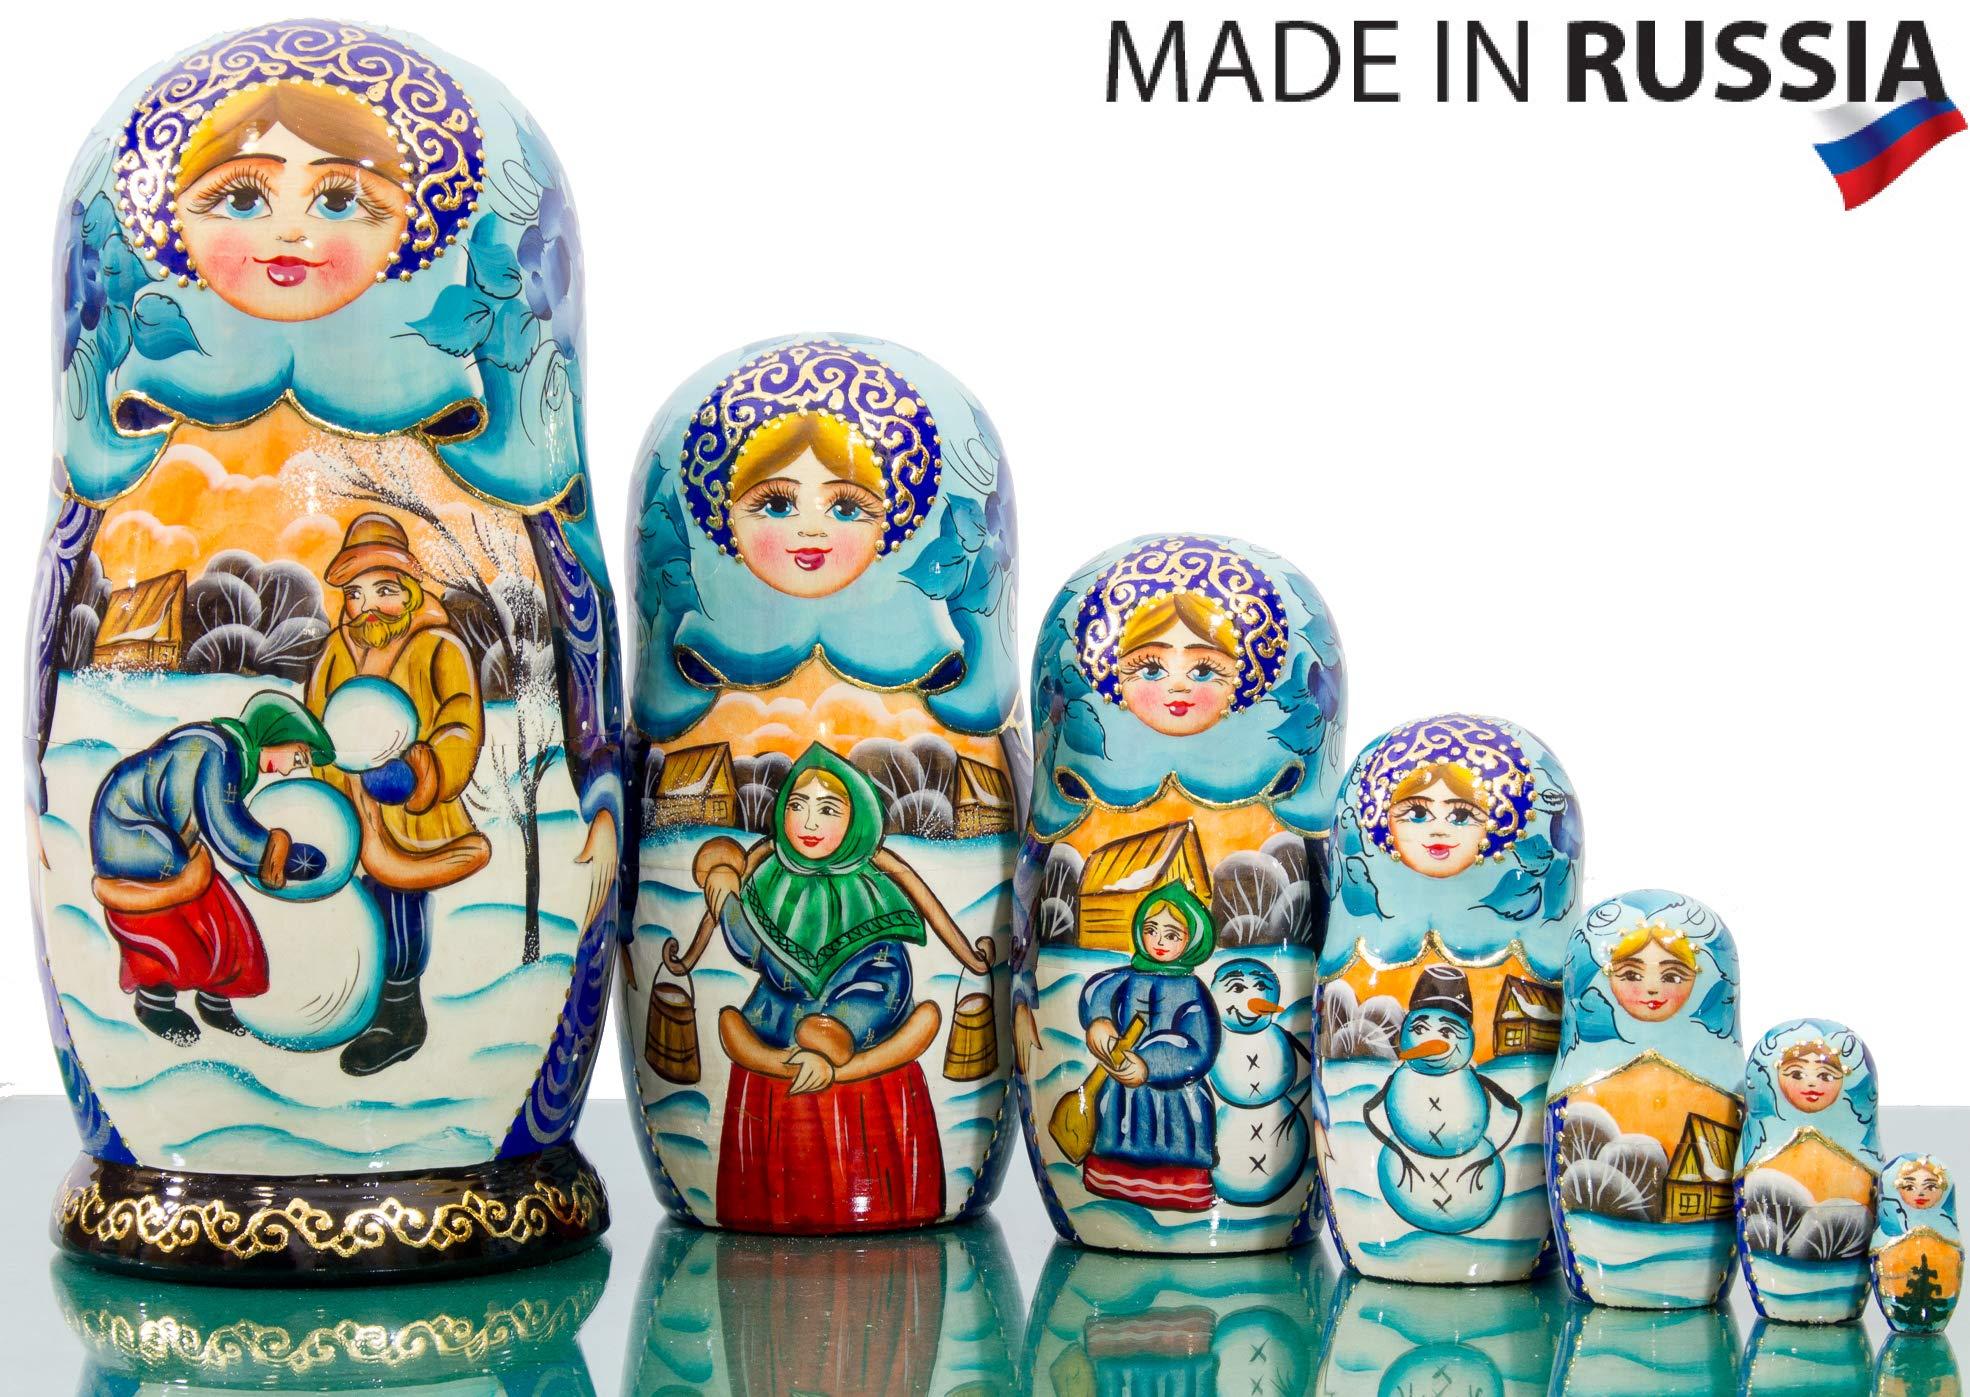 Nesting Doll - Russian Village - Hand Painted in Russia - Big Size - Wooden Decoration Gift Doll - Matryoshka Babushka (Design D, 8.25`` (7 Dolls in 1))